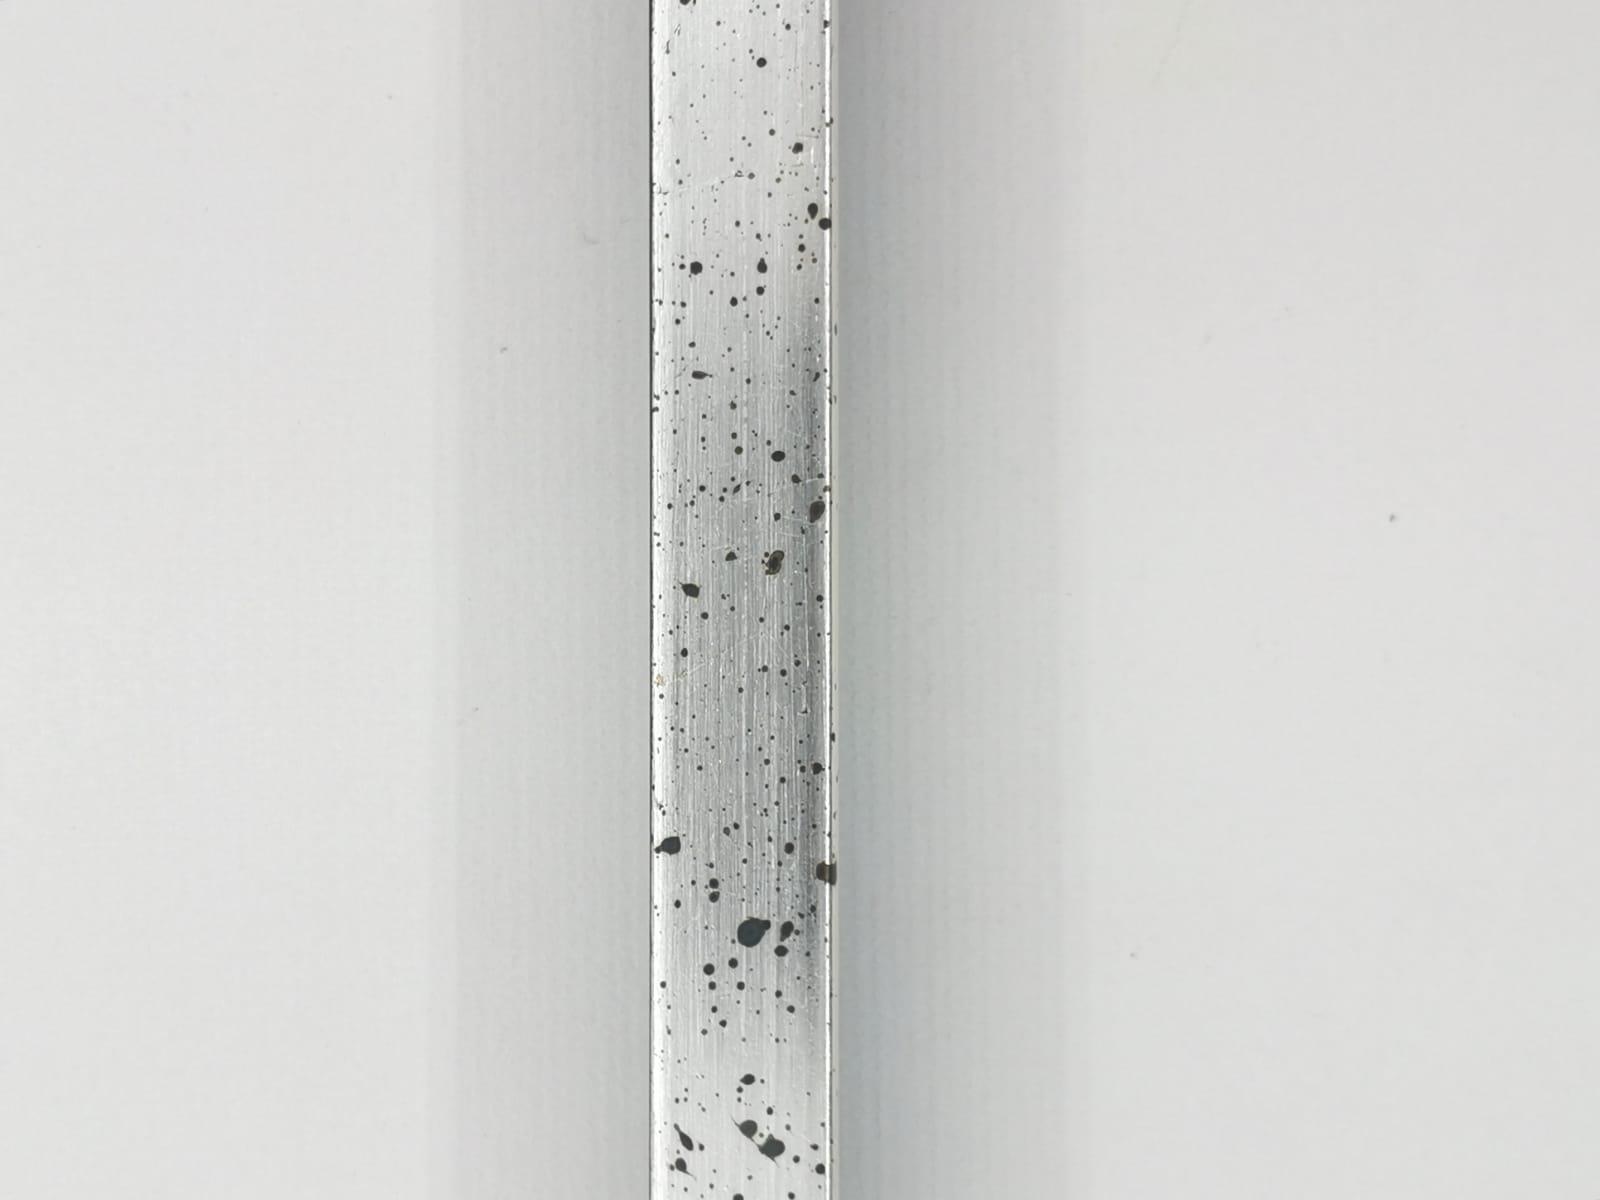 3020-1232